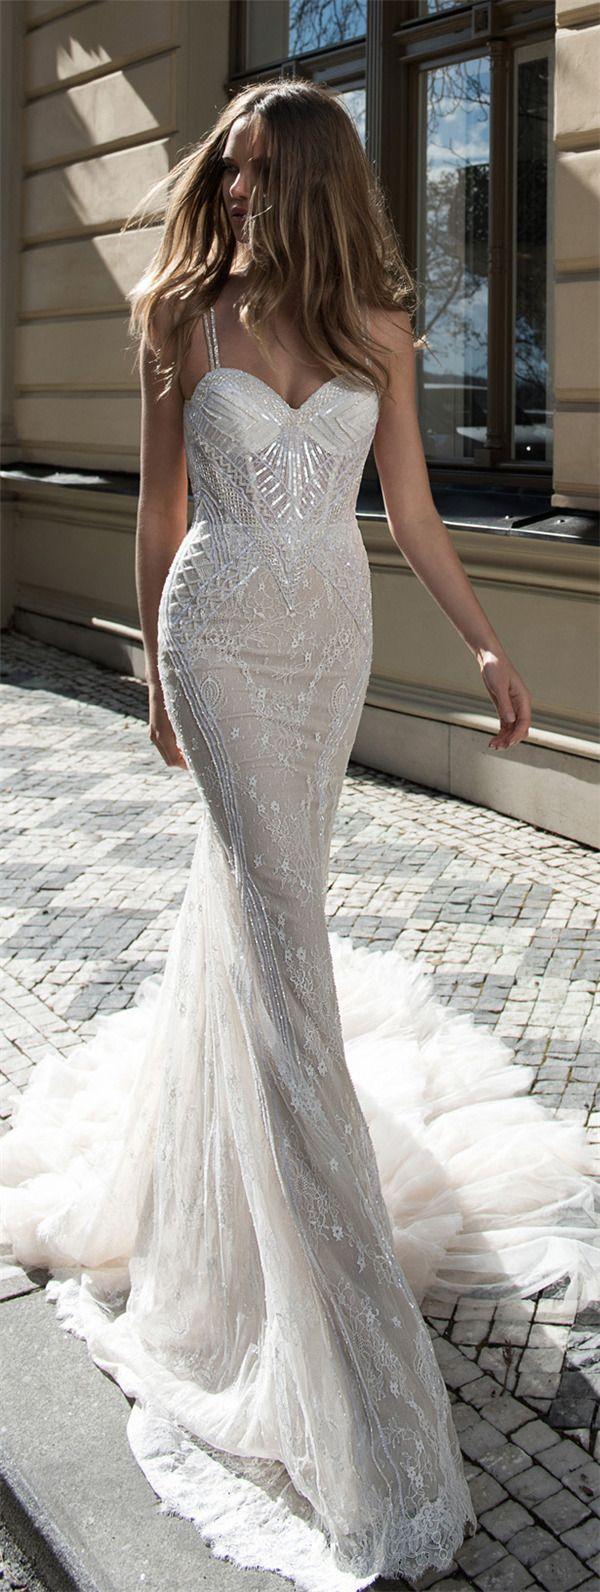 Berta Bridal Fall 2015 Wedding Dresses 40 See More: https://www.deerpearlflowers.com/berta-bridal-fall-2015-collection/ http://felisa.uk/